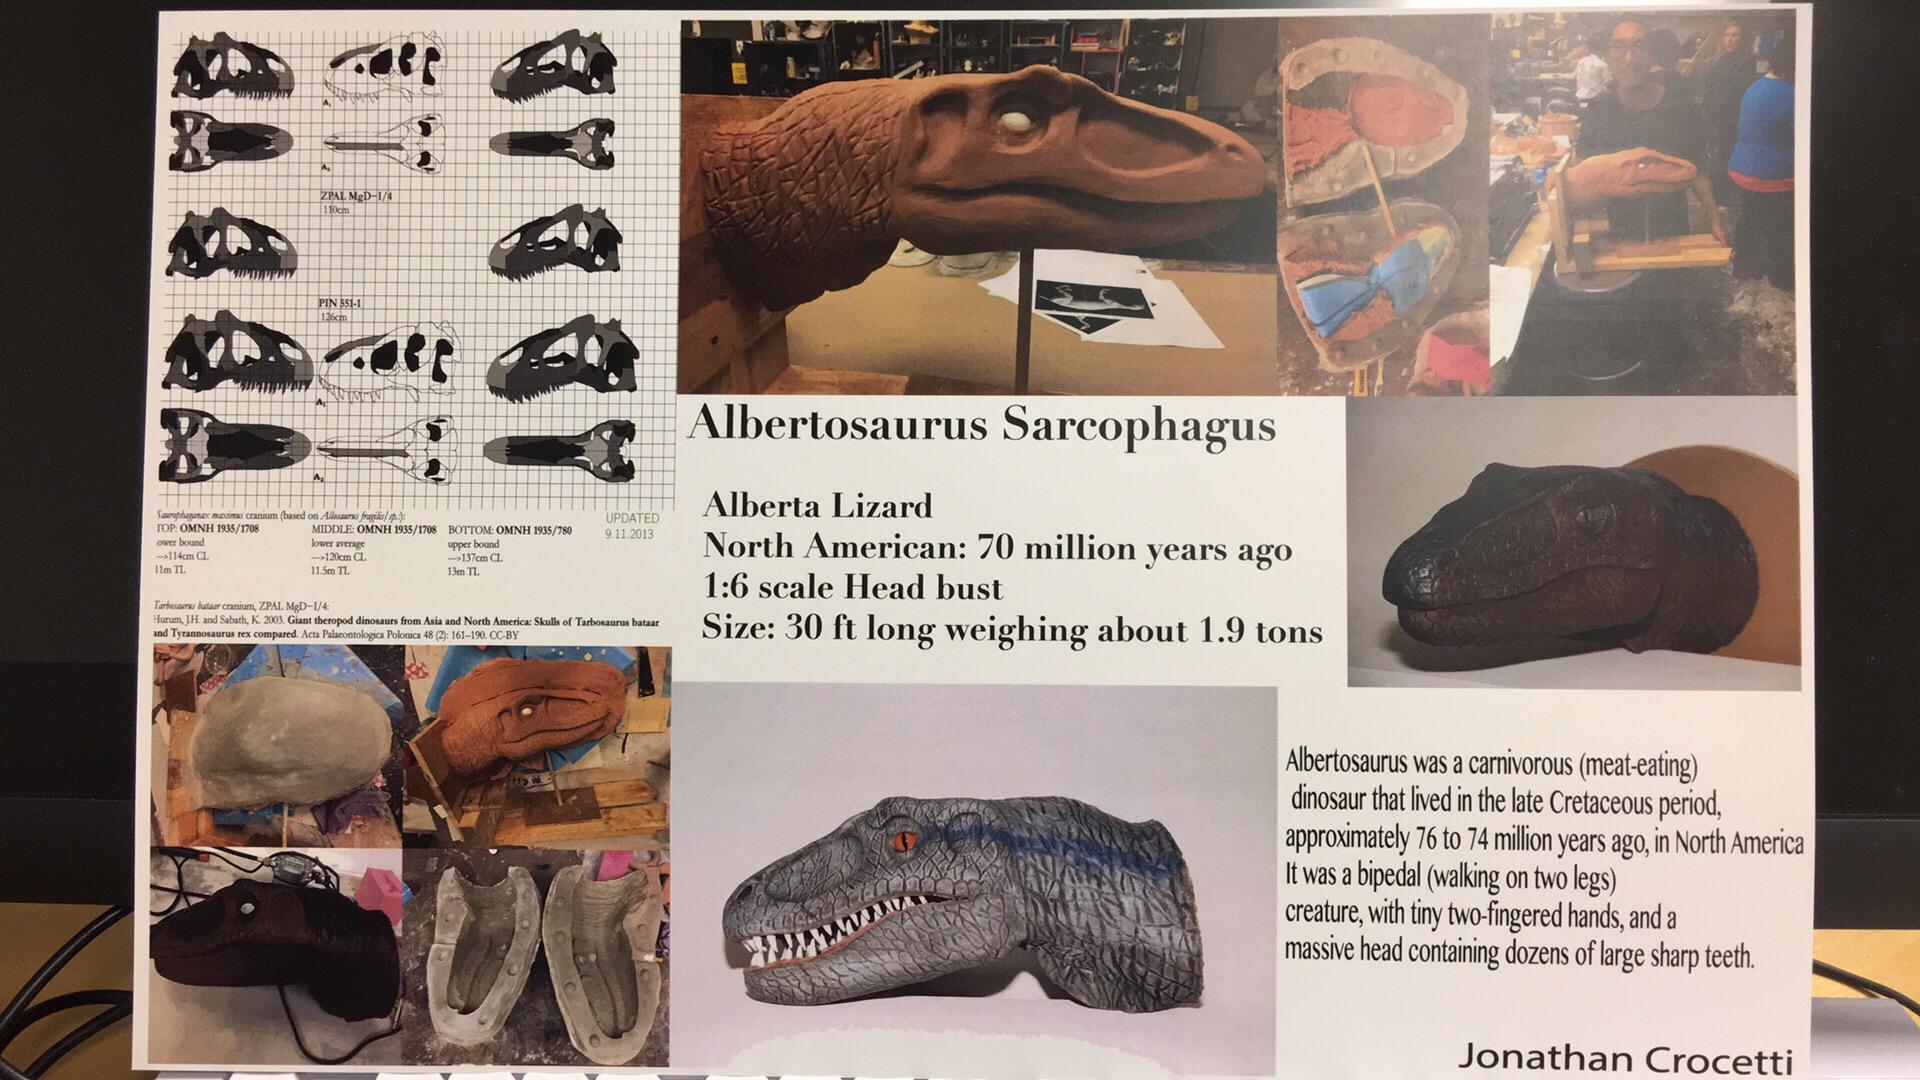 Dinosaur info card